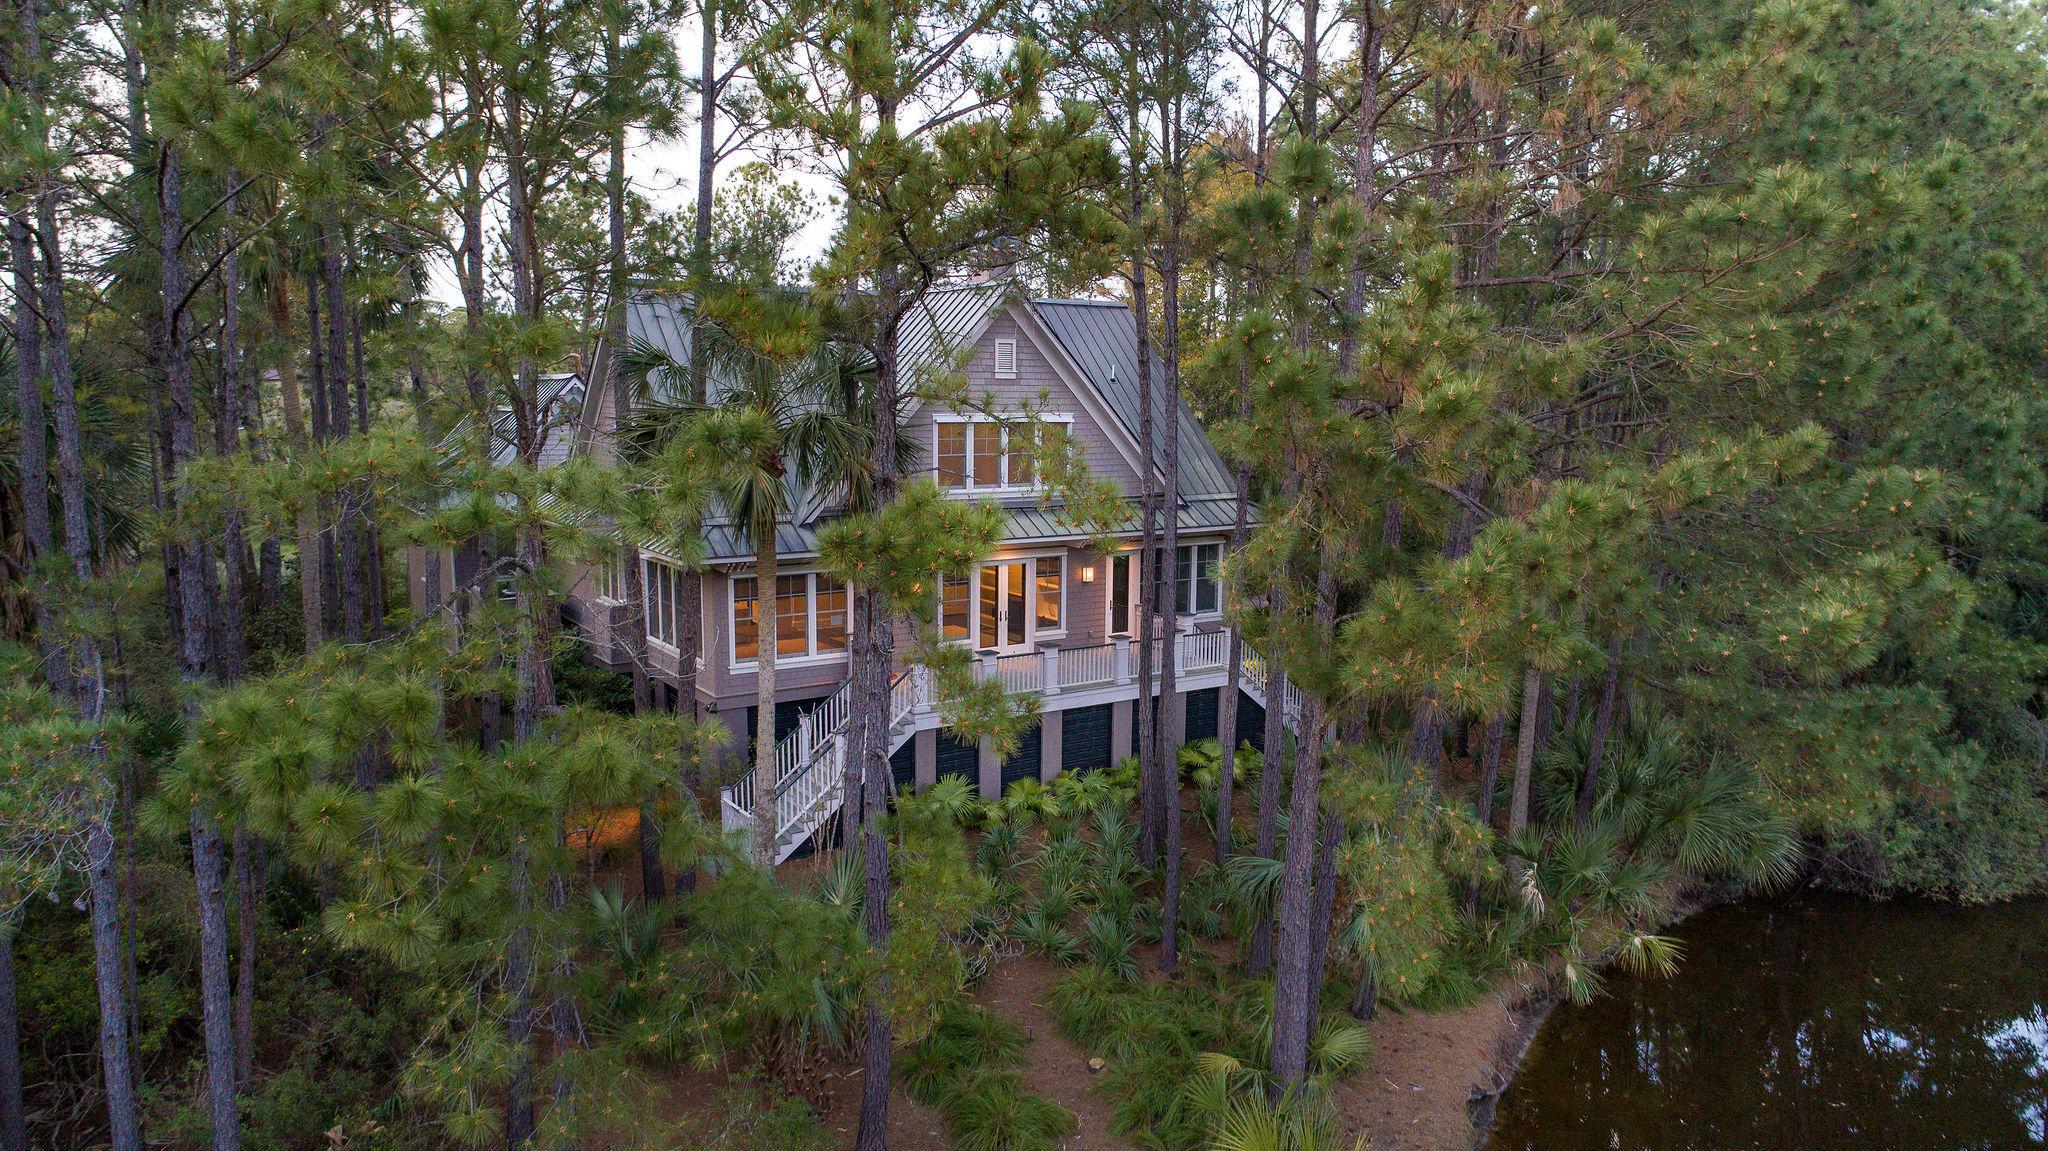 Kiawah Island Homes For Sale - 3 Grey Widgeon, Kiawah Island, SC - 67